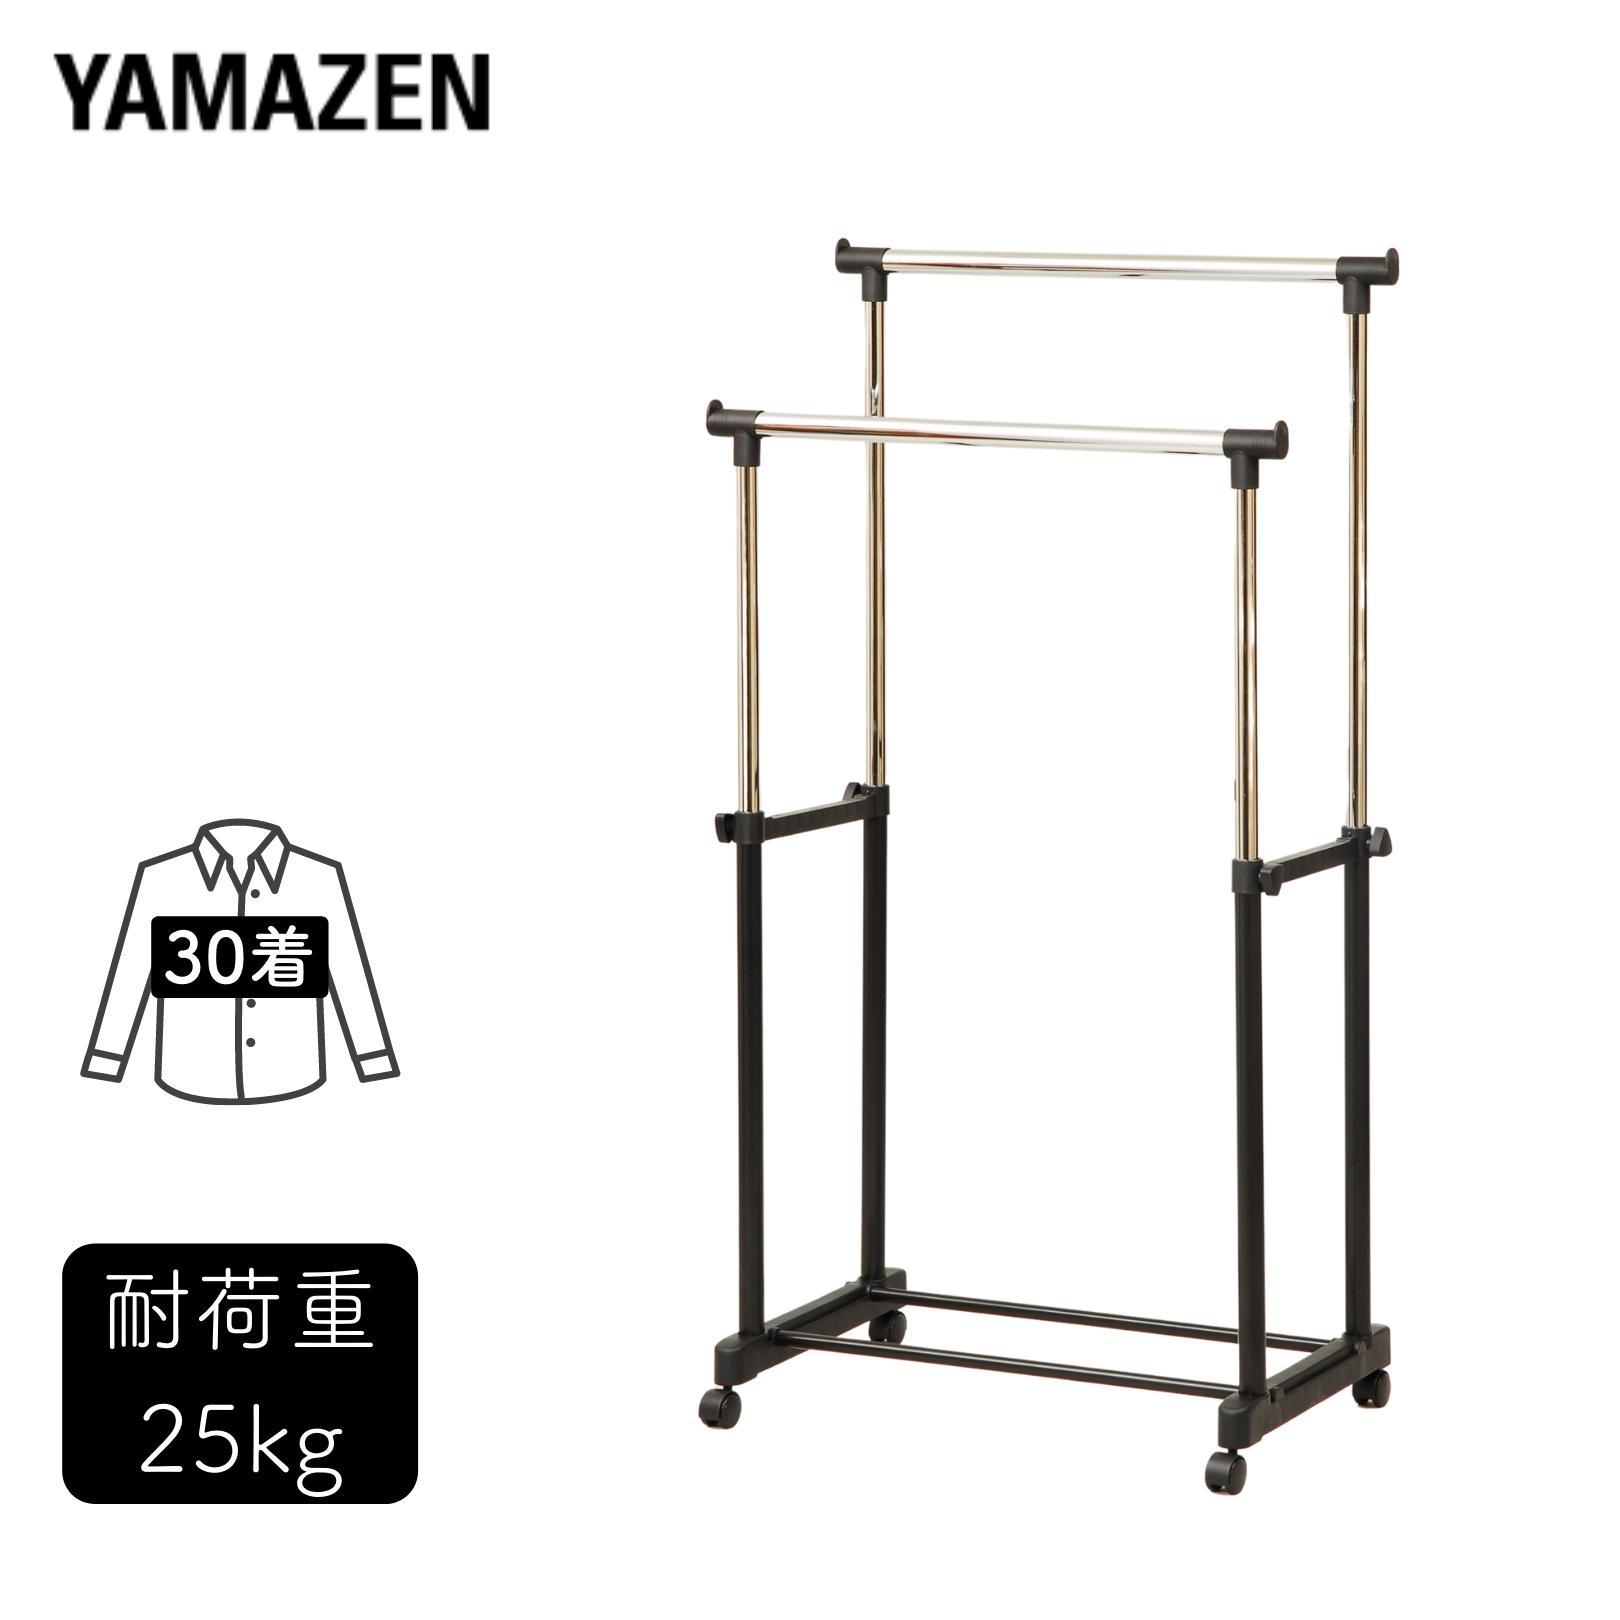 E Kurashi Take Bh W Two Steps With The Hanger Rack Double Caster Pipe Closet Yamazen Rakuten Global Market